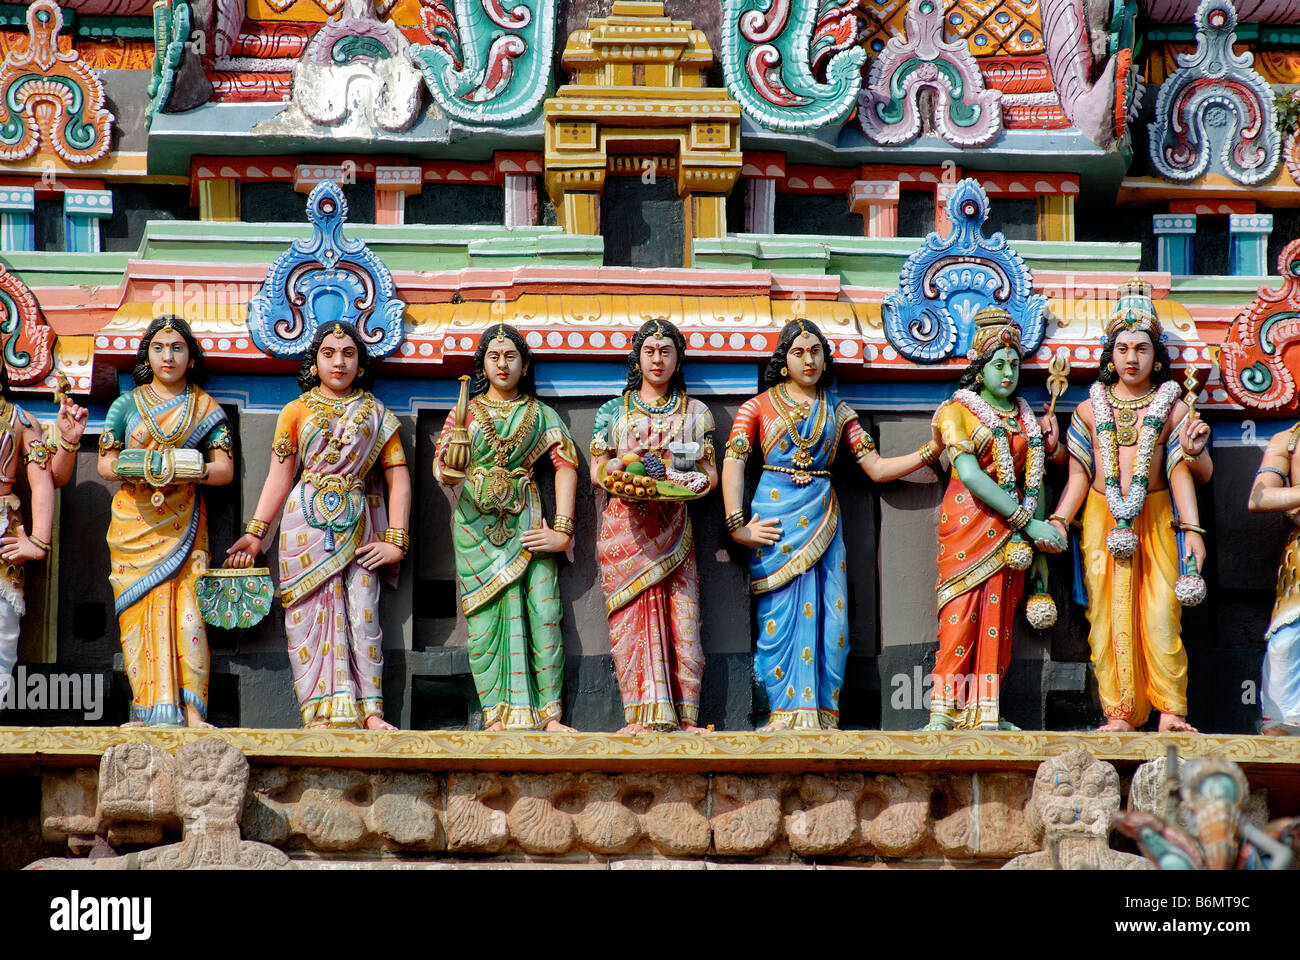 Chidambaram Temple Sculptures Stock Photos & Chidambaram Temple